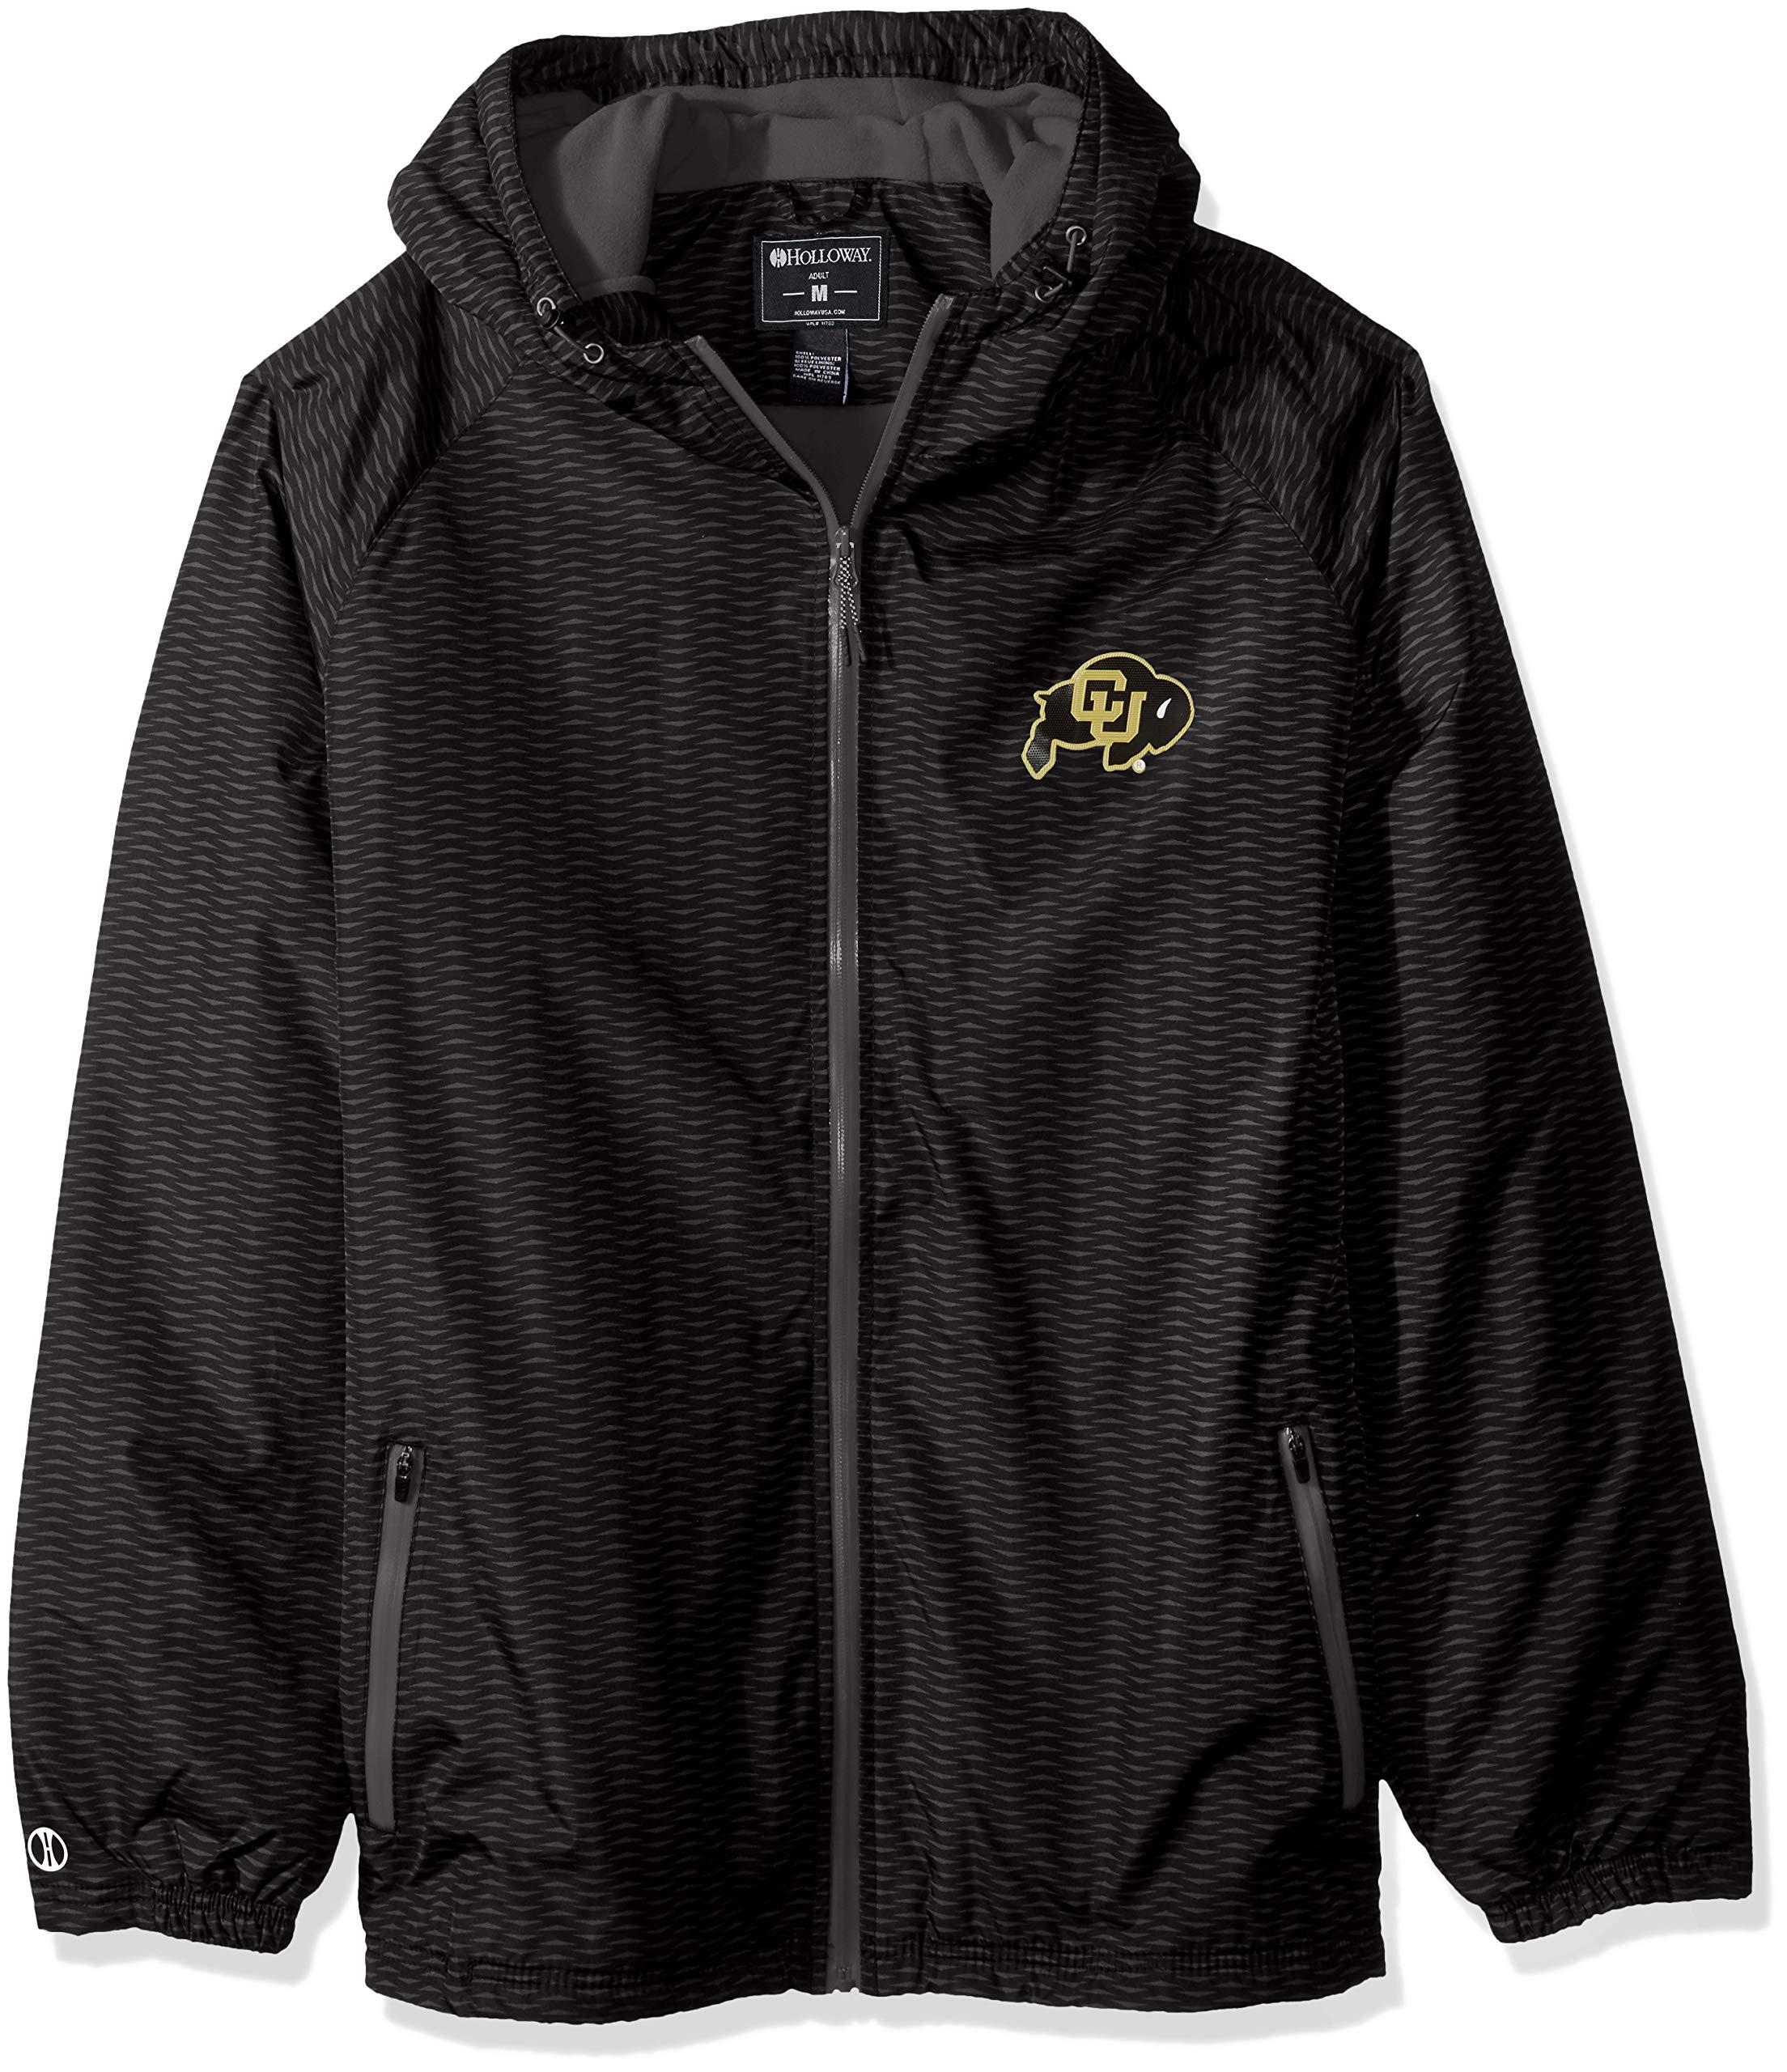 Ouray Sportswear NCAA Colorado Buffaloes Men's Range Jacket, Carbon, Small